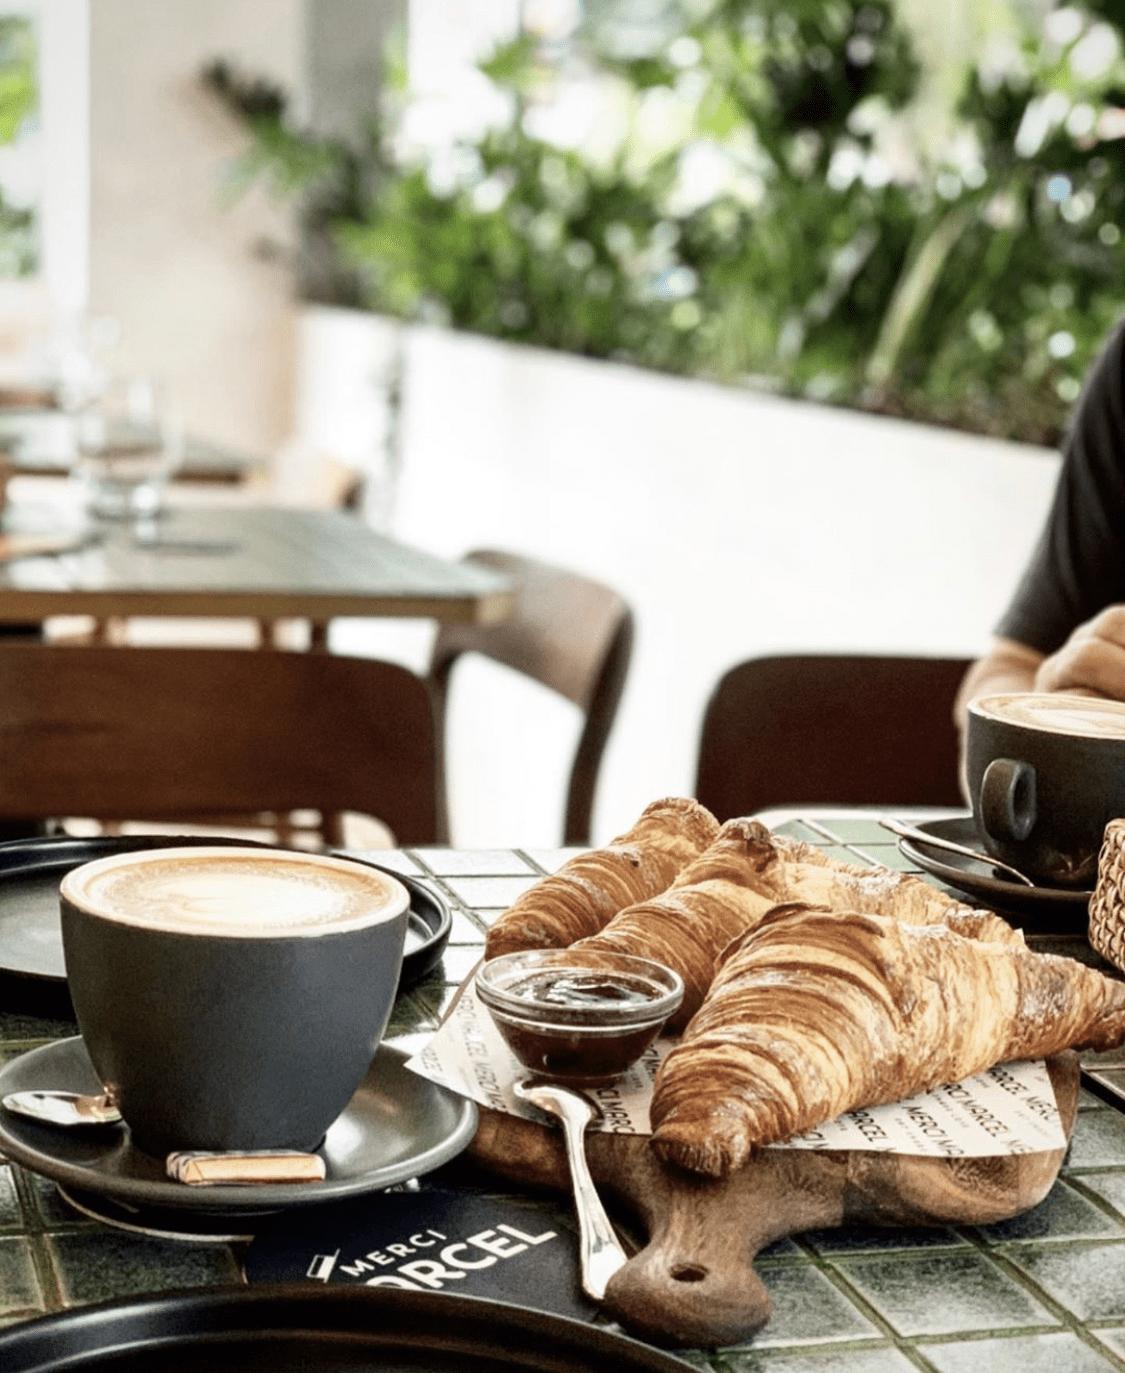 Croissants at Merci Marcel